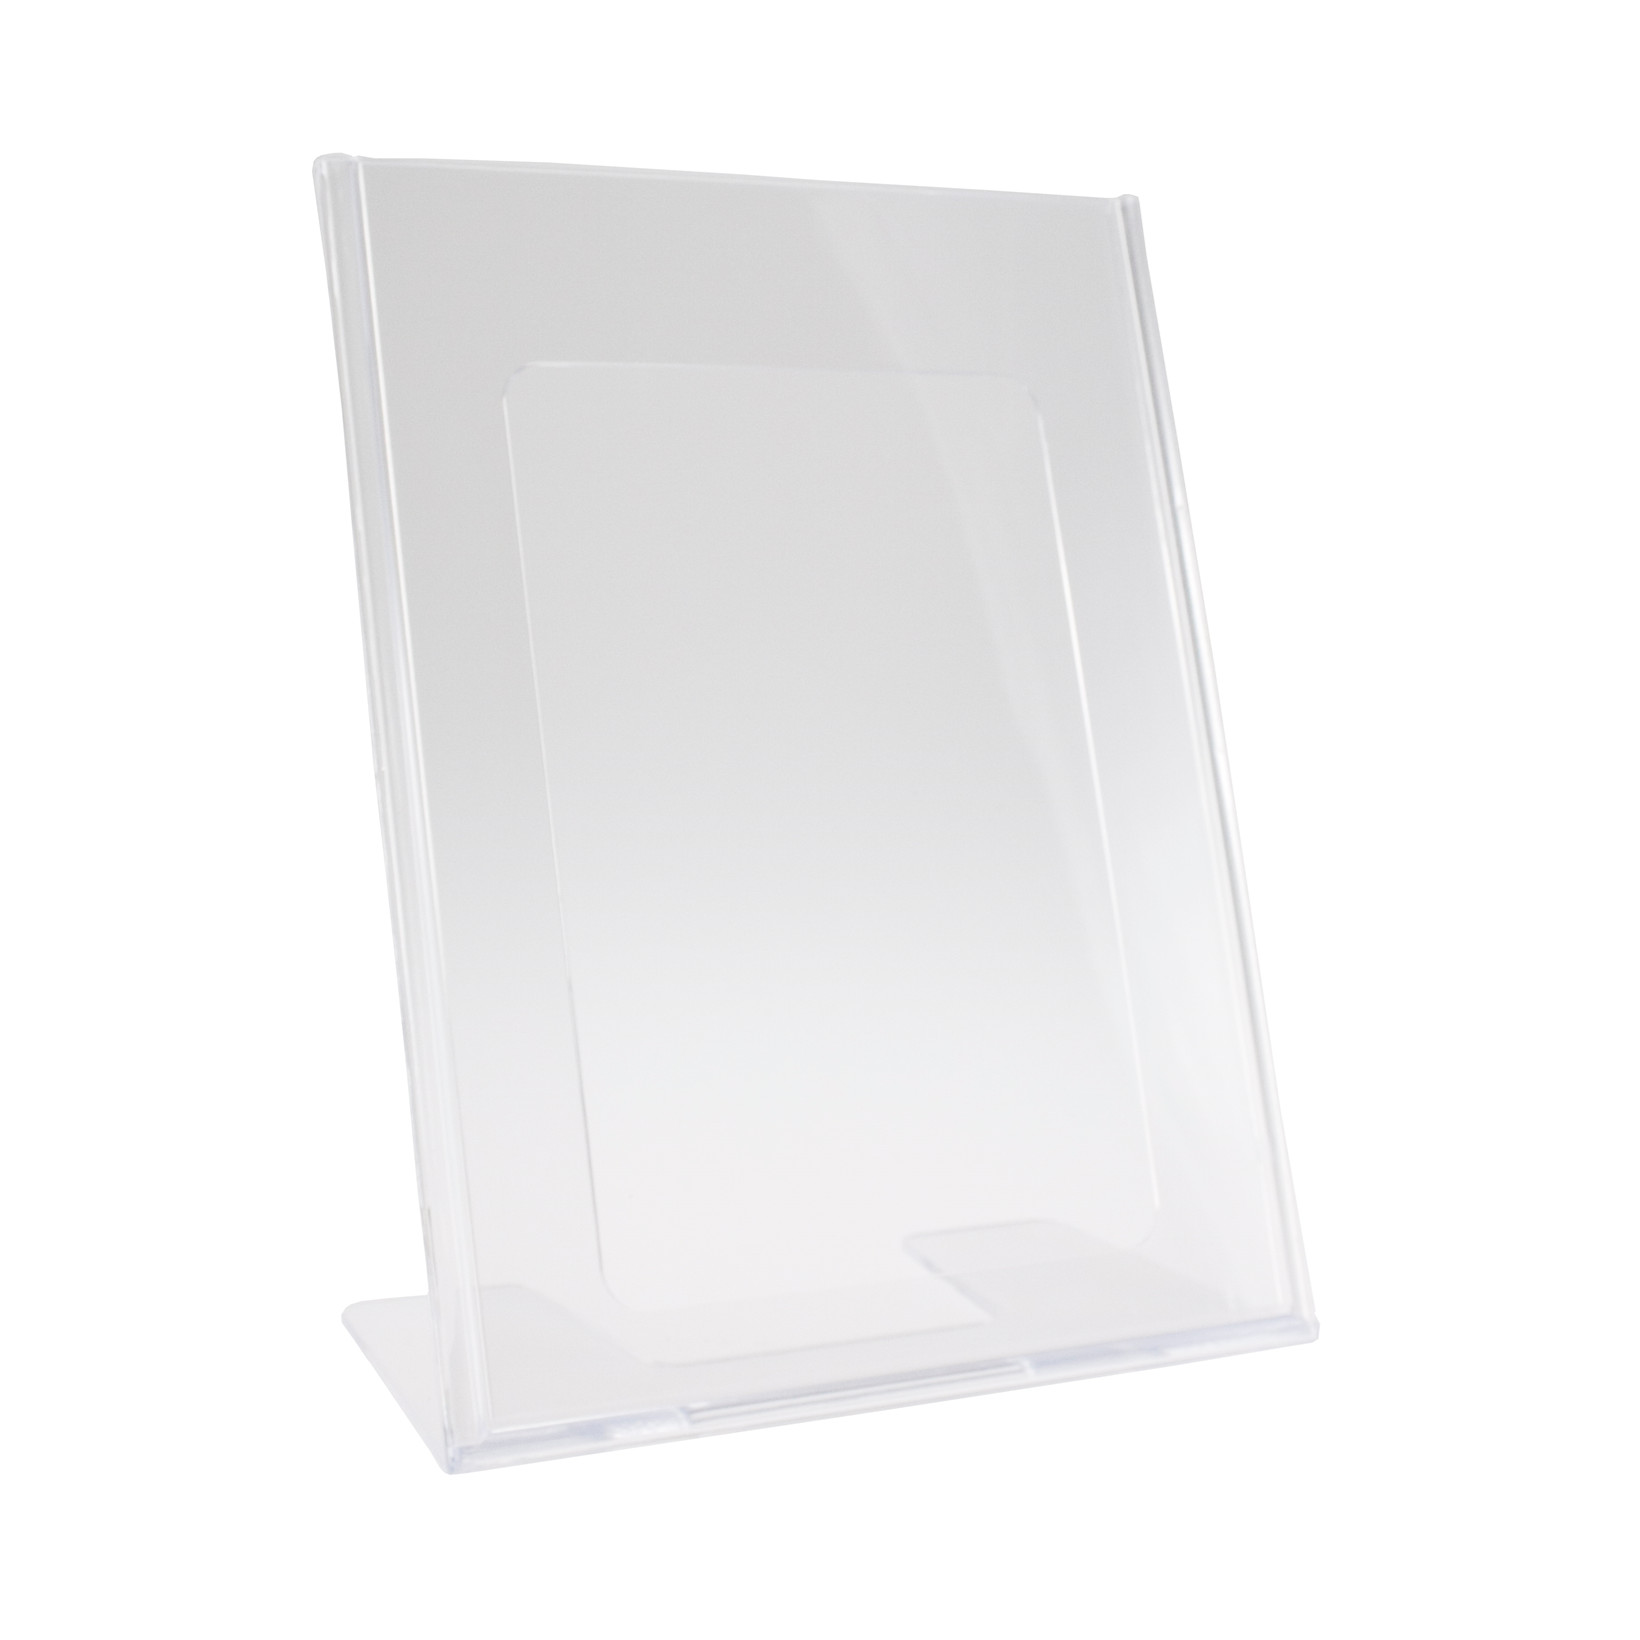 Brochuredisplay BNT A5 klar L-form t/bord 148x210mm